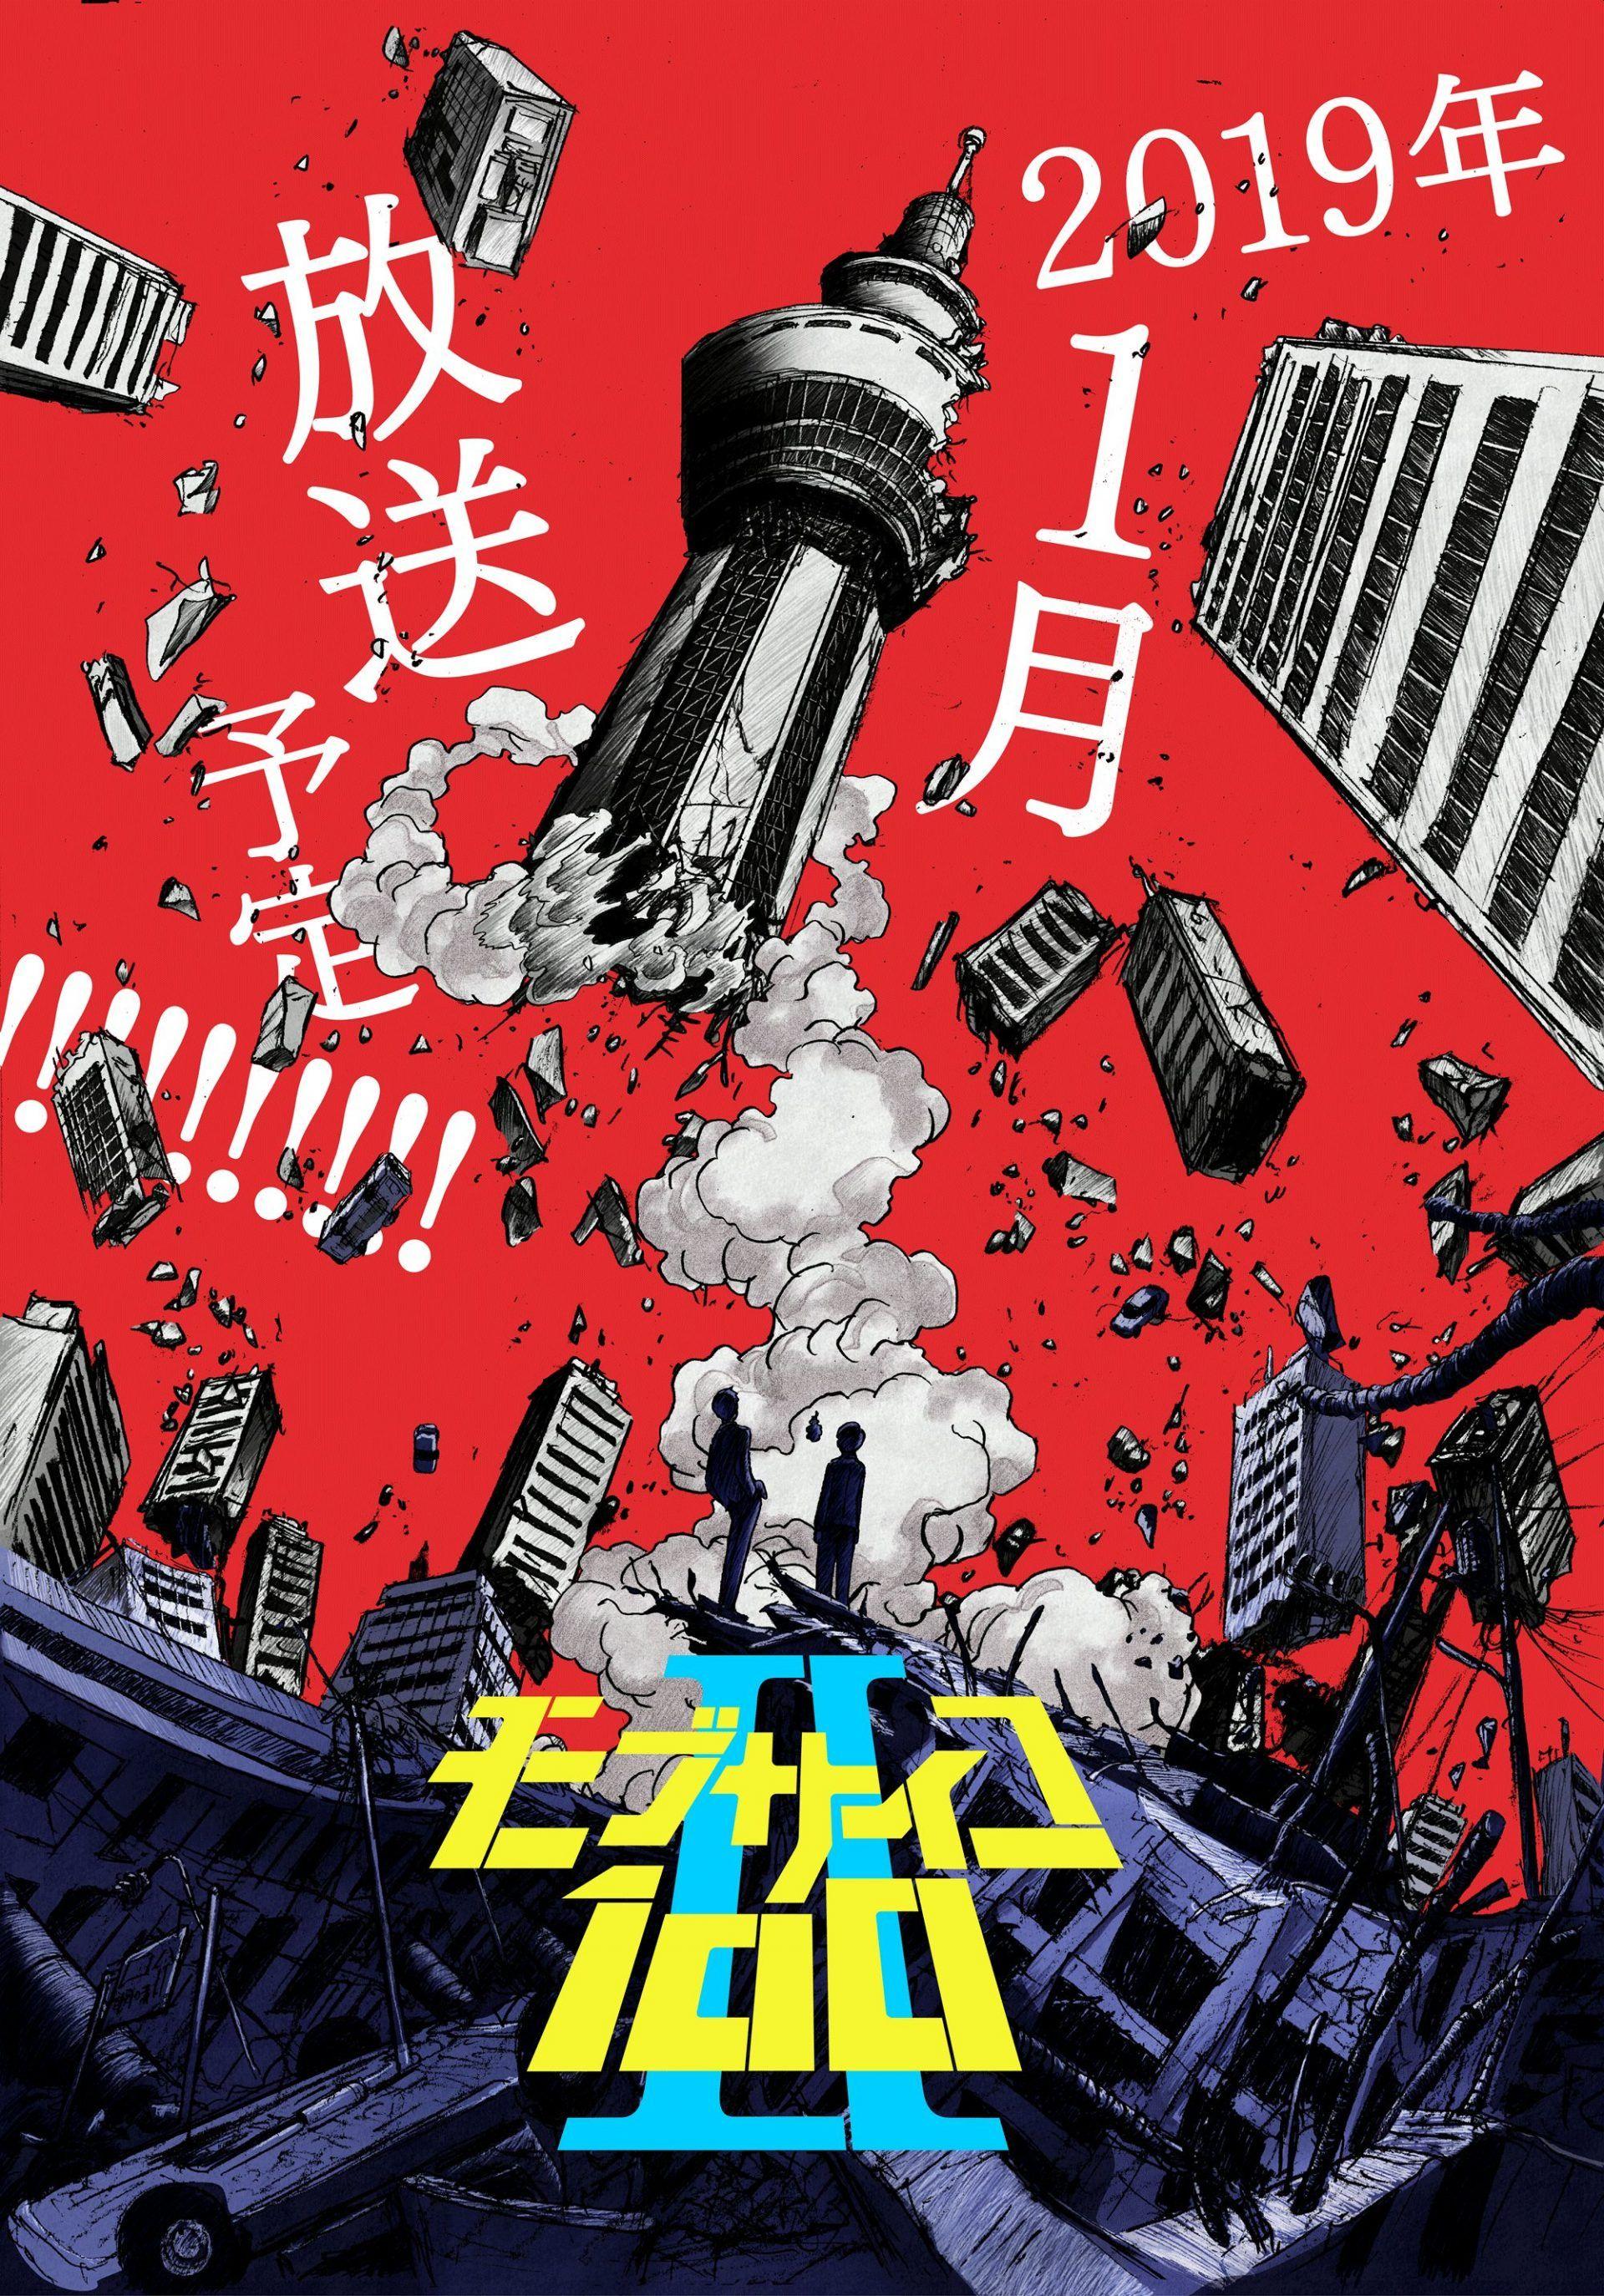 Mob Psycho 100 Papel De Parede Anime Anime Cartaz